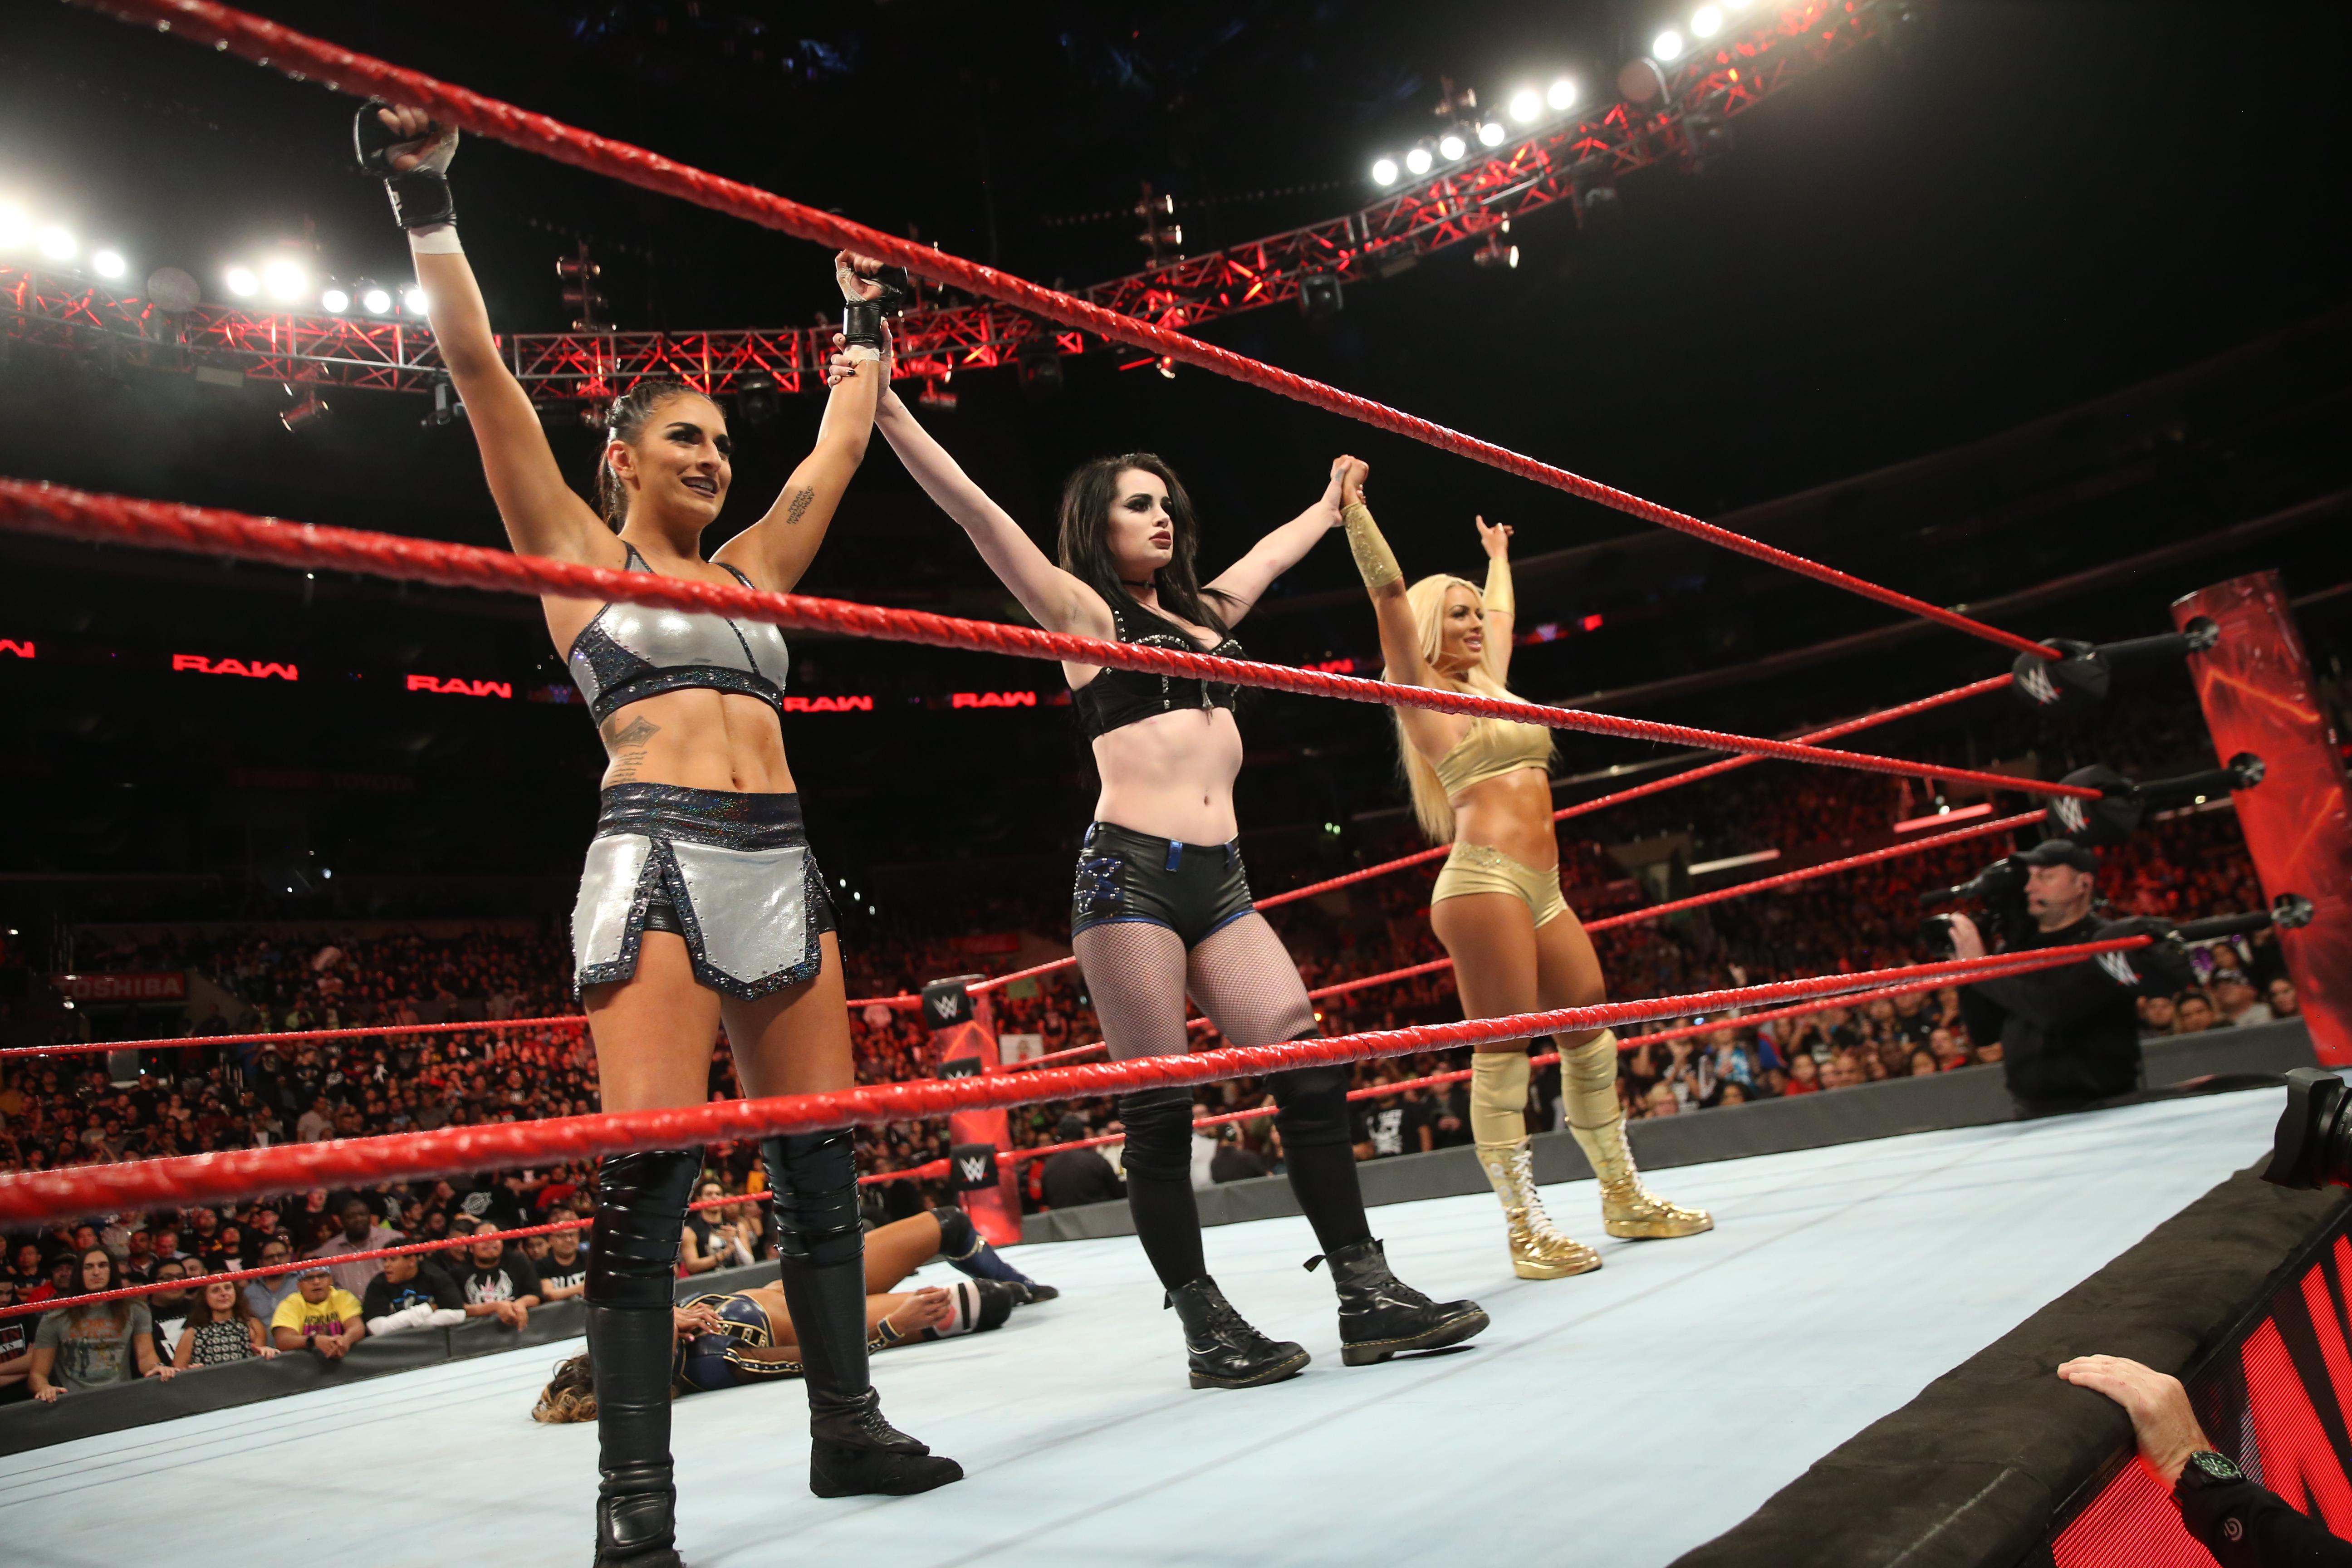 WWE『RAW #1281』は明日午前10時にスタート!